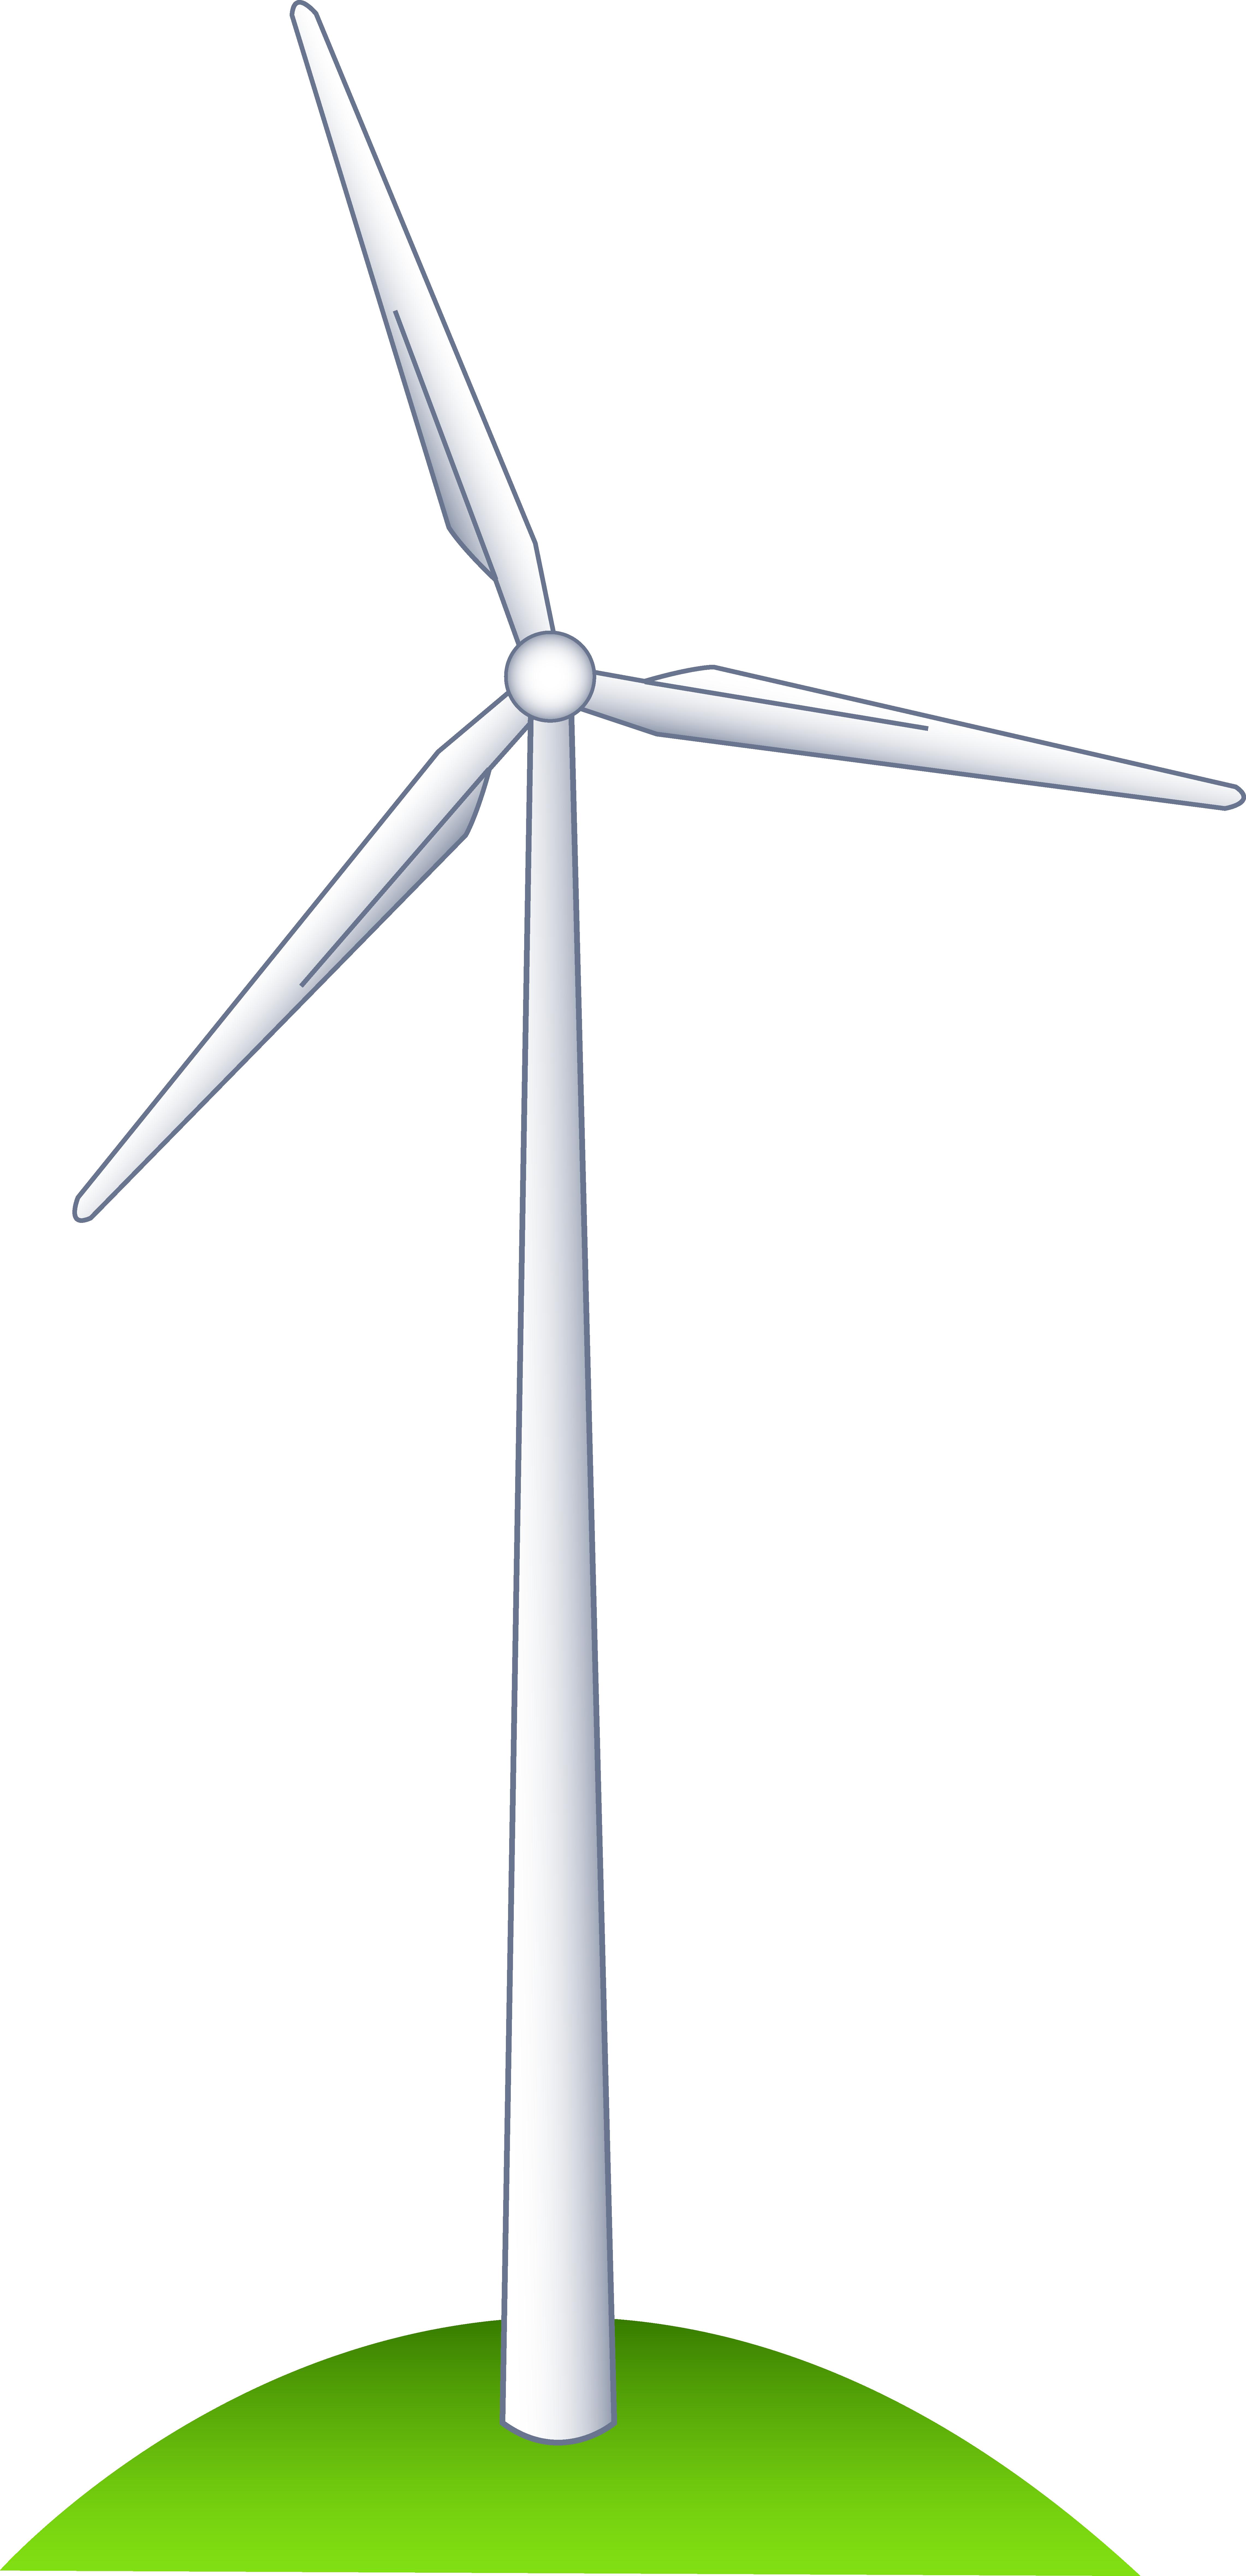 Wind Turbine clipart #14